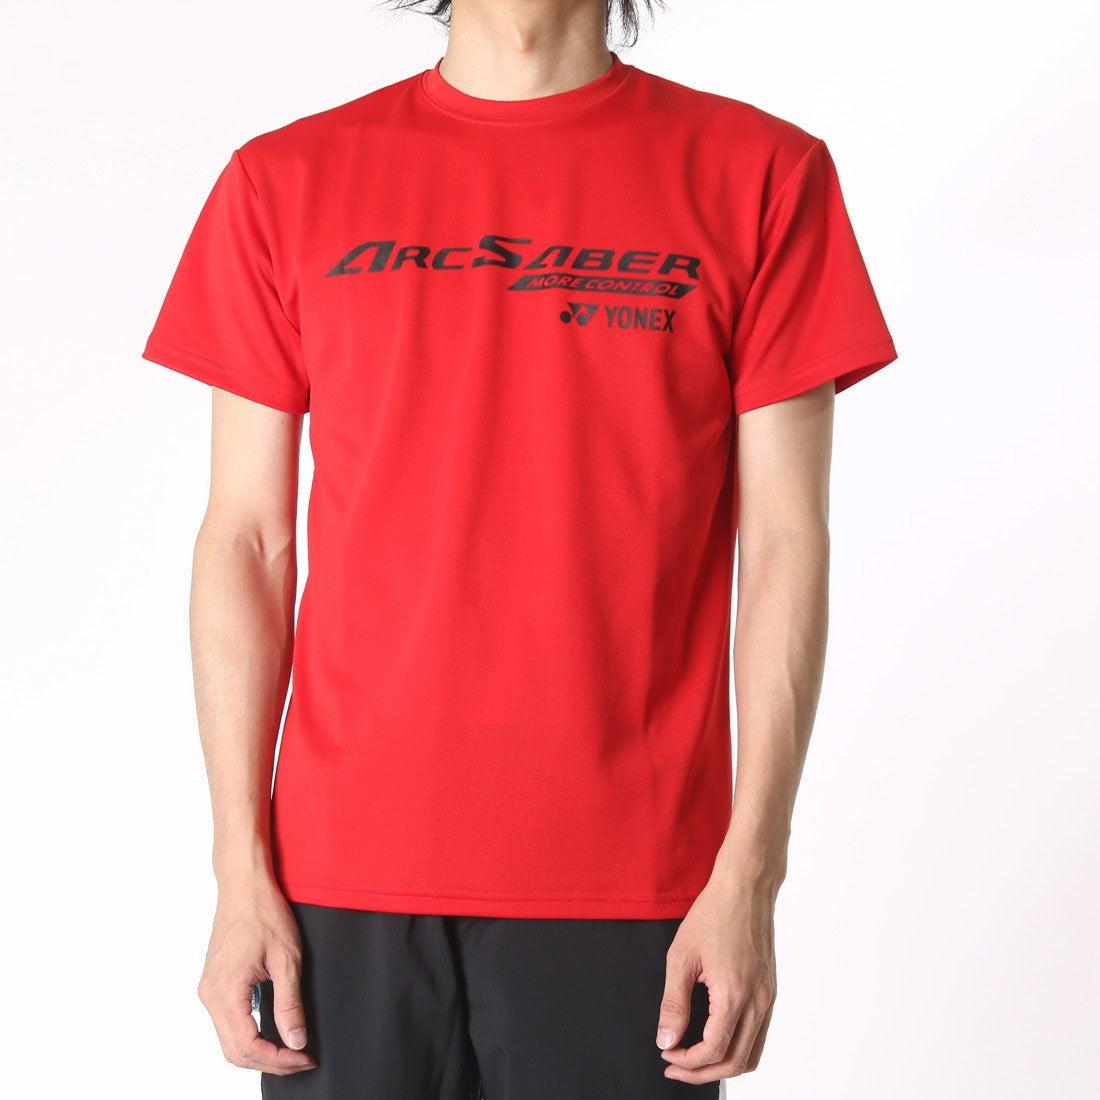 0ed9843991e11 ヨネックス YONEX ユニセックス バドミントン 半袖Tシャツ Tシャツ 16271Y -レディースファッション通販 ロコンドガールズコレクション  (LOCONDO GIRL'S COLLECTION)